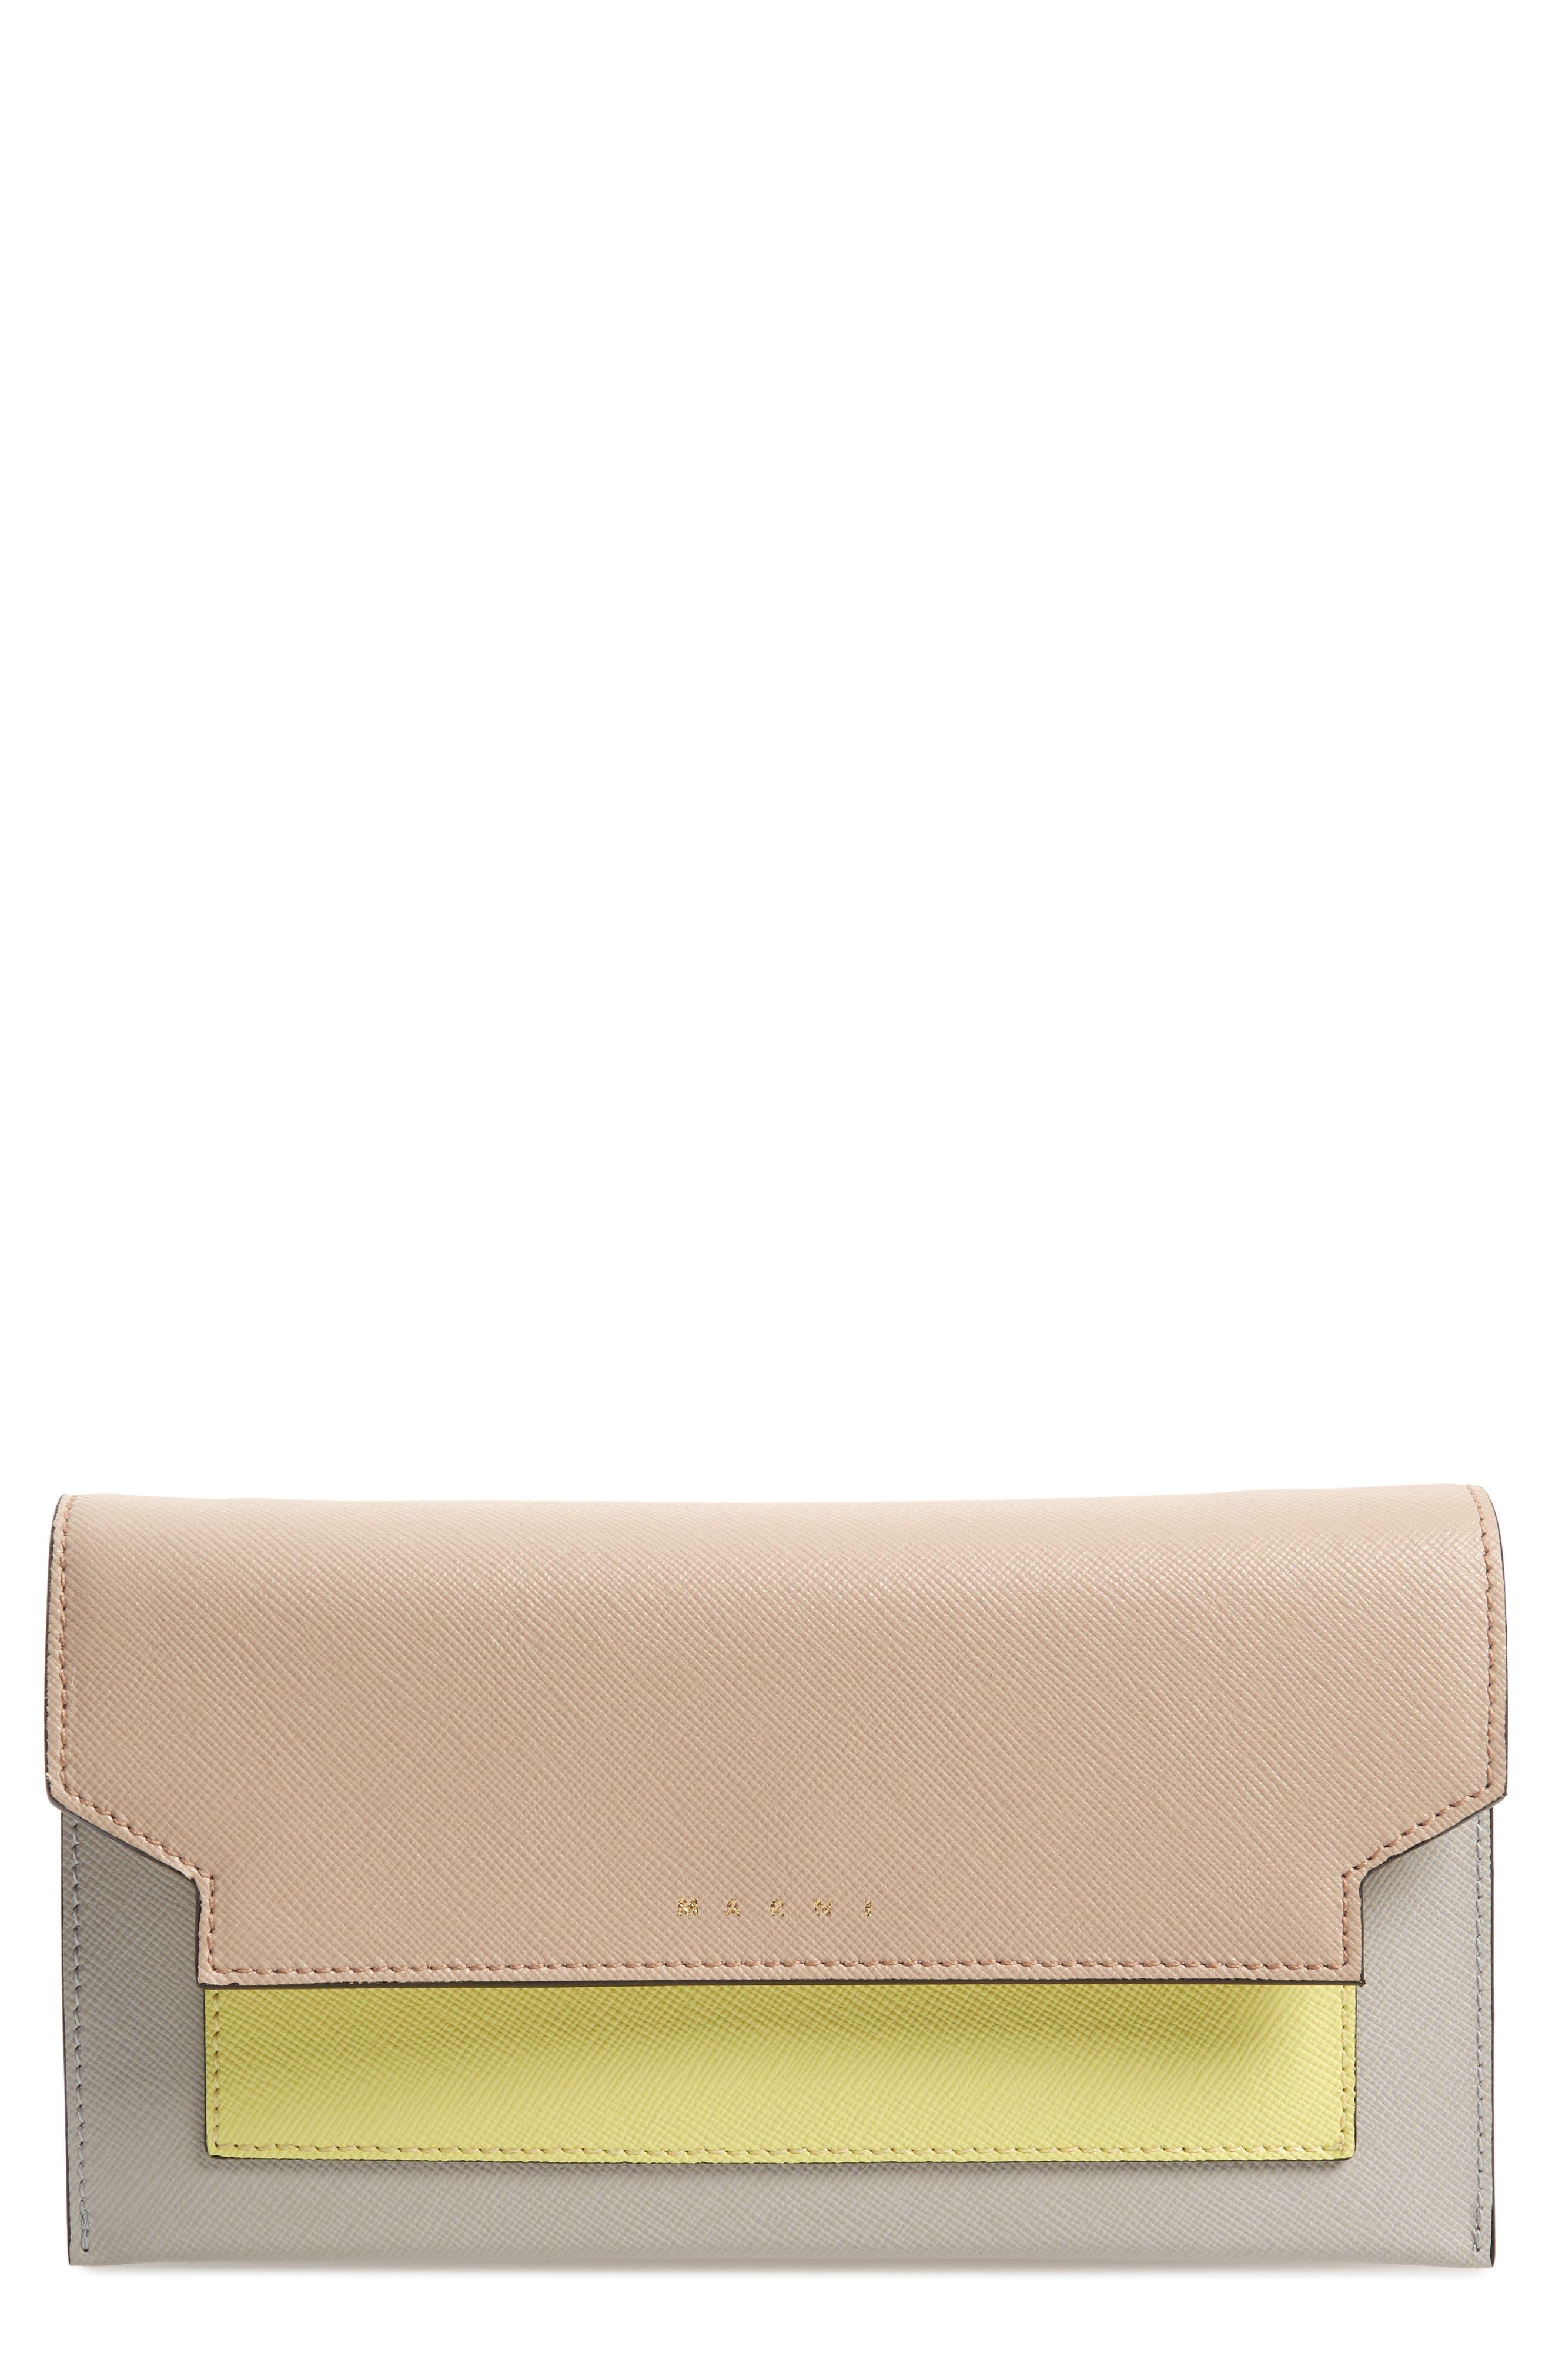 Trunk Leather Crossbody Wallet, Main, color, LIGHT CAMEL/ VANILLA/ PELICAN